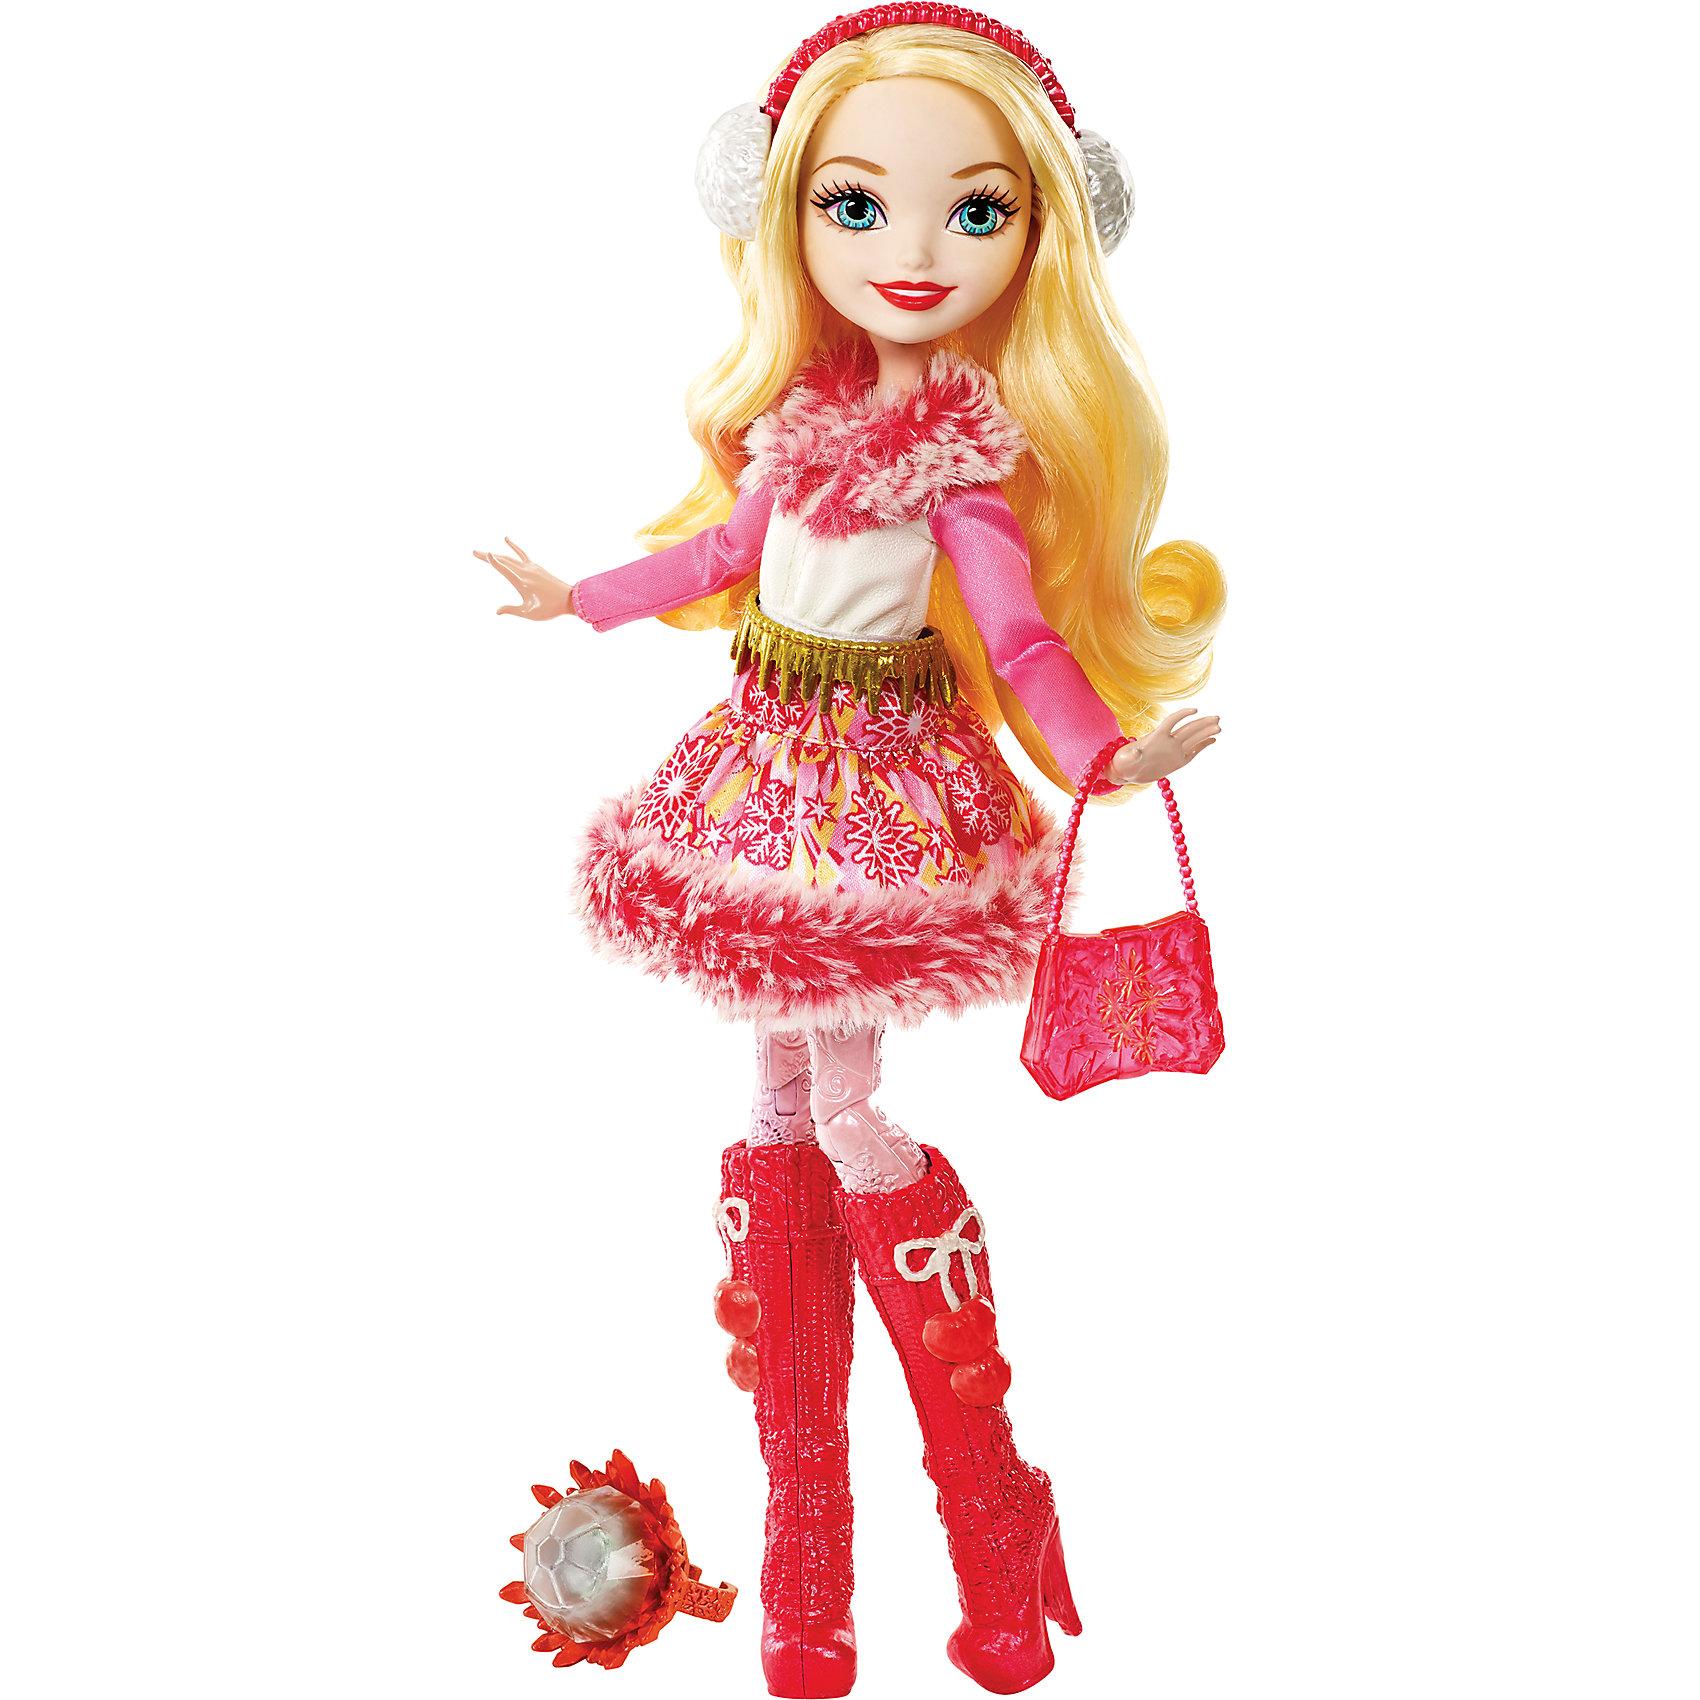 Mattel Кукла Эппл Уайт из коллекции Заколдованная зима, Ever After High mattel кукла эппл уайт ever after high